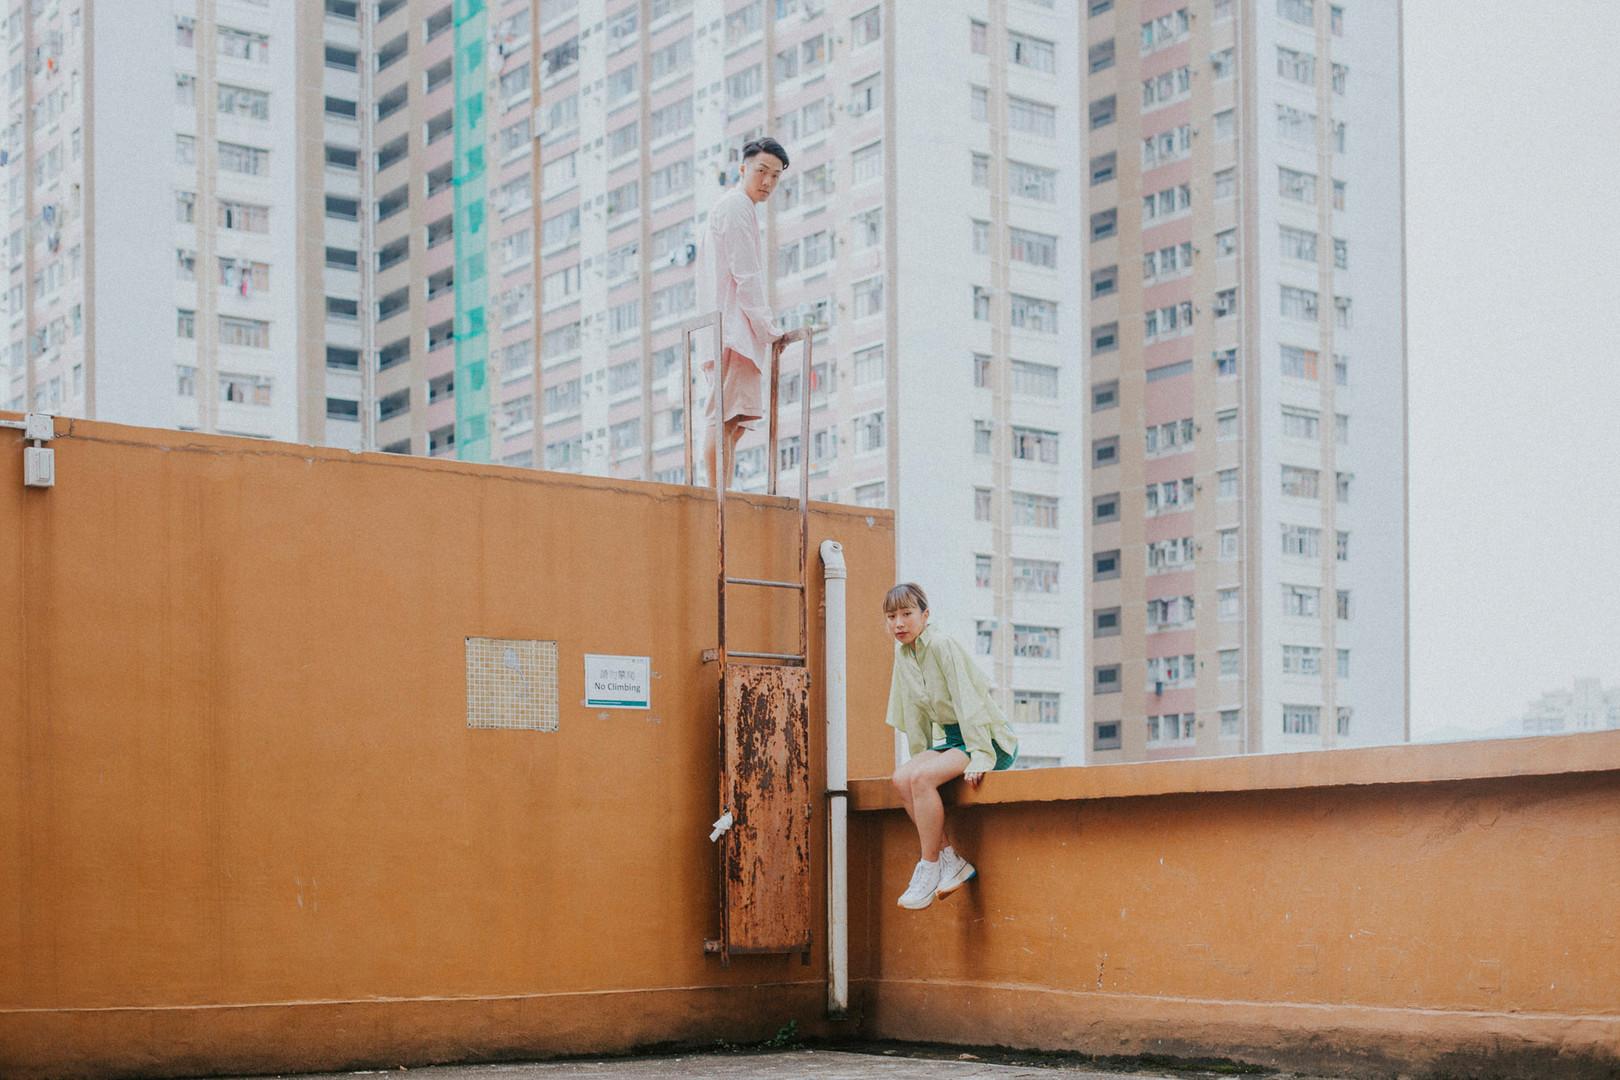 005-storyboard.jpg